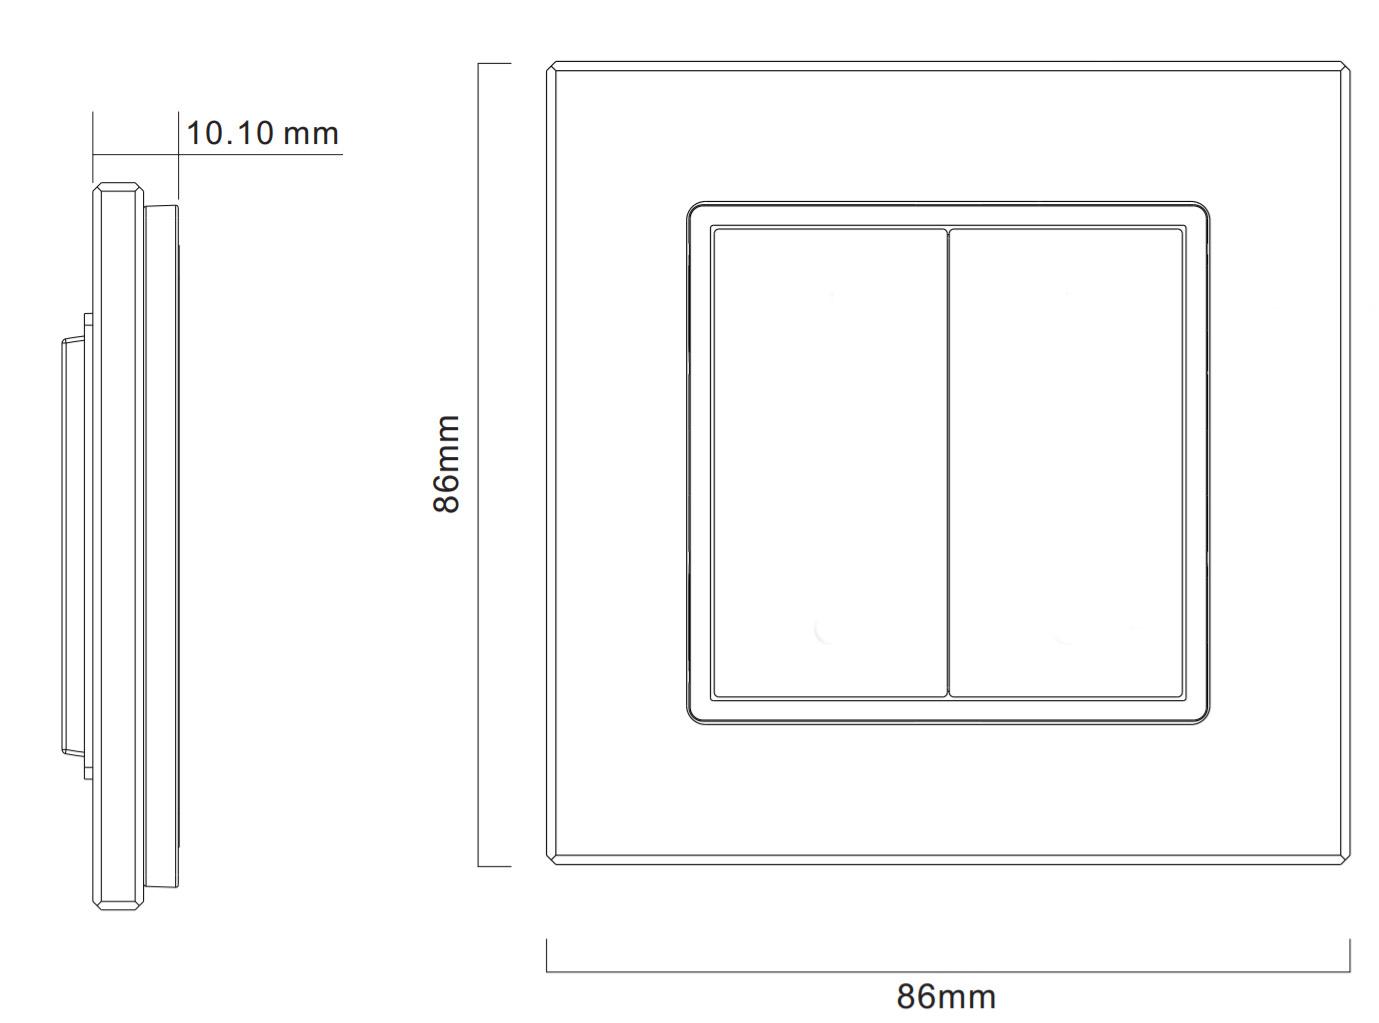 Sunricher RF 2-zónový LED nástěnný dvoutlačítkový ovladač - DIM10 - bílý (SR-2833K2)-Technický výkres